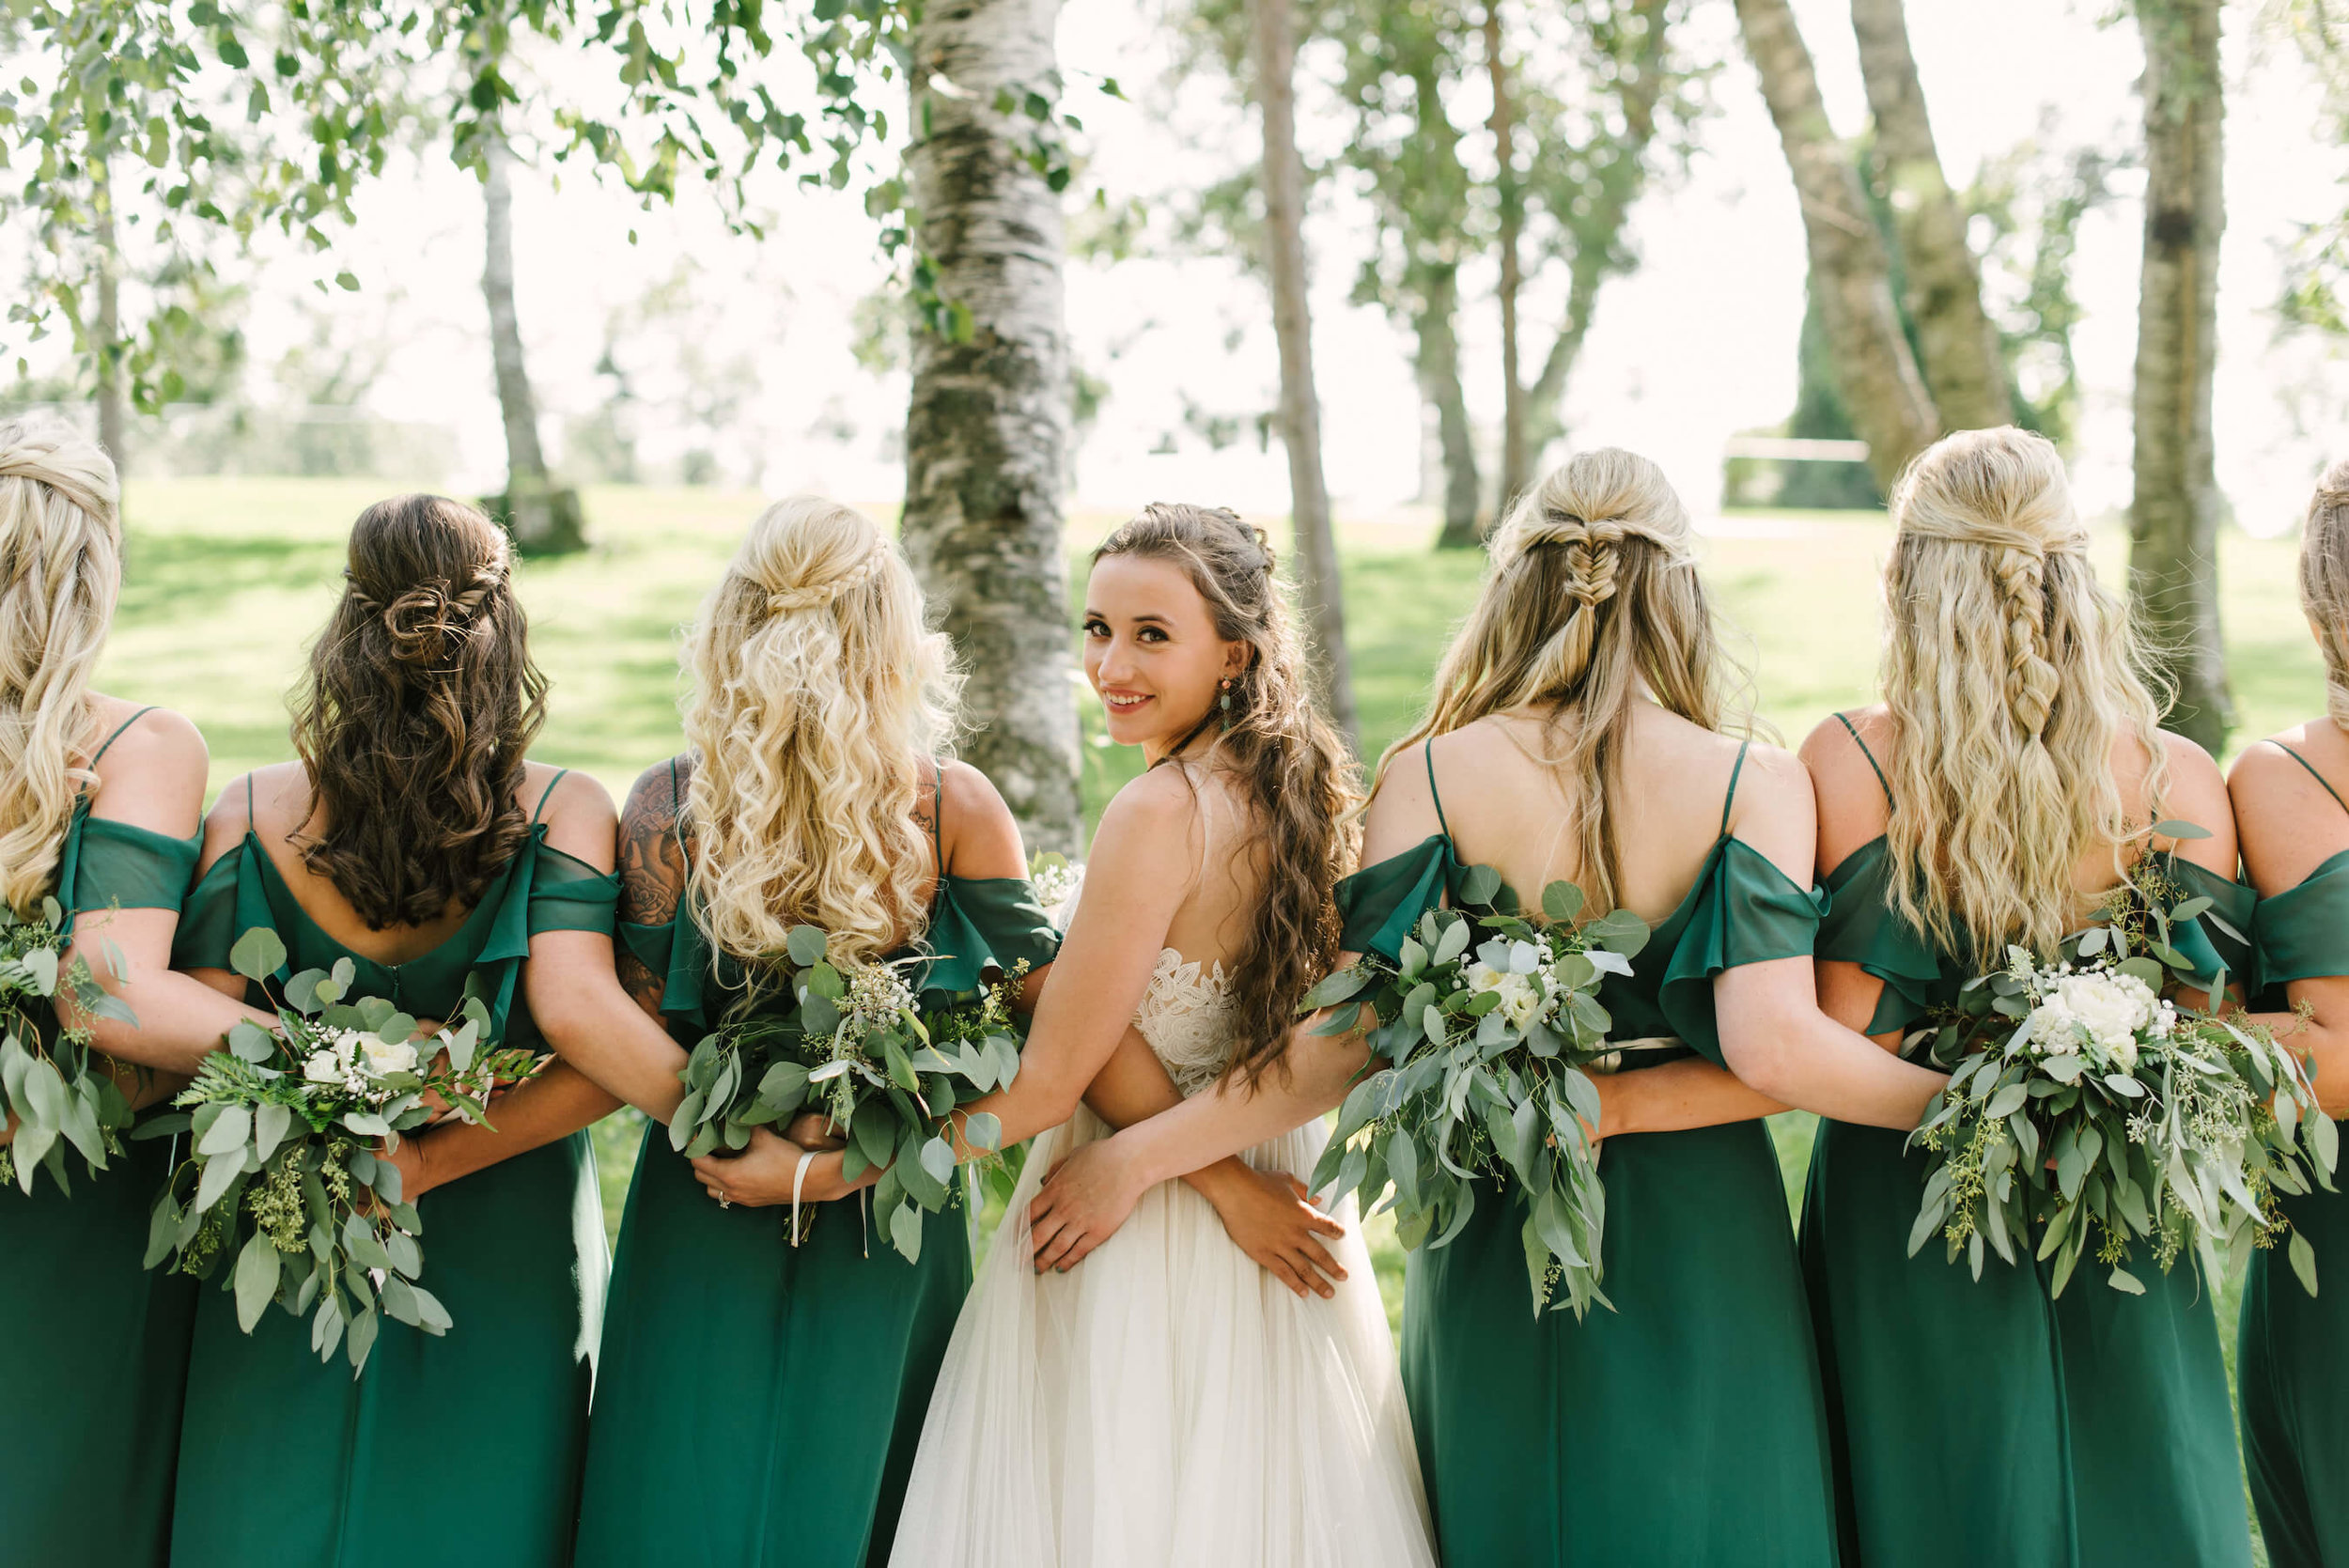 engle-olson-wedding-blair-taylor-20.jpg